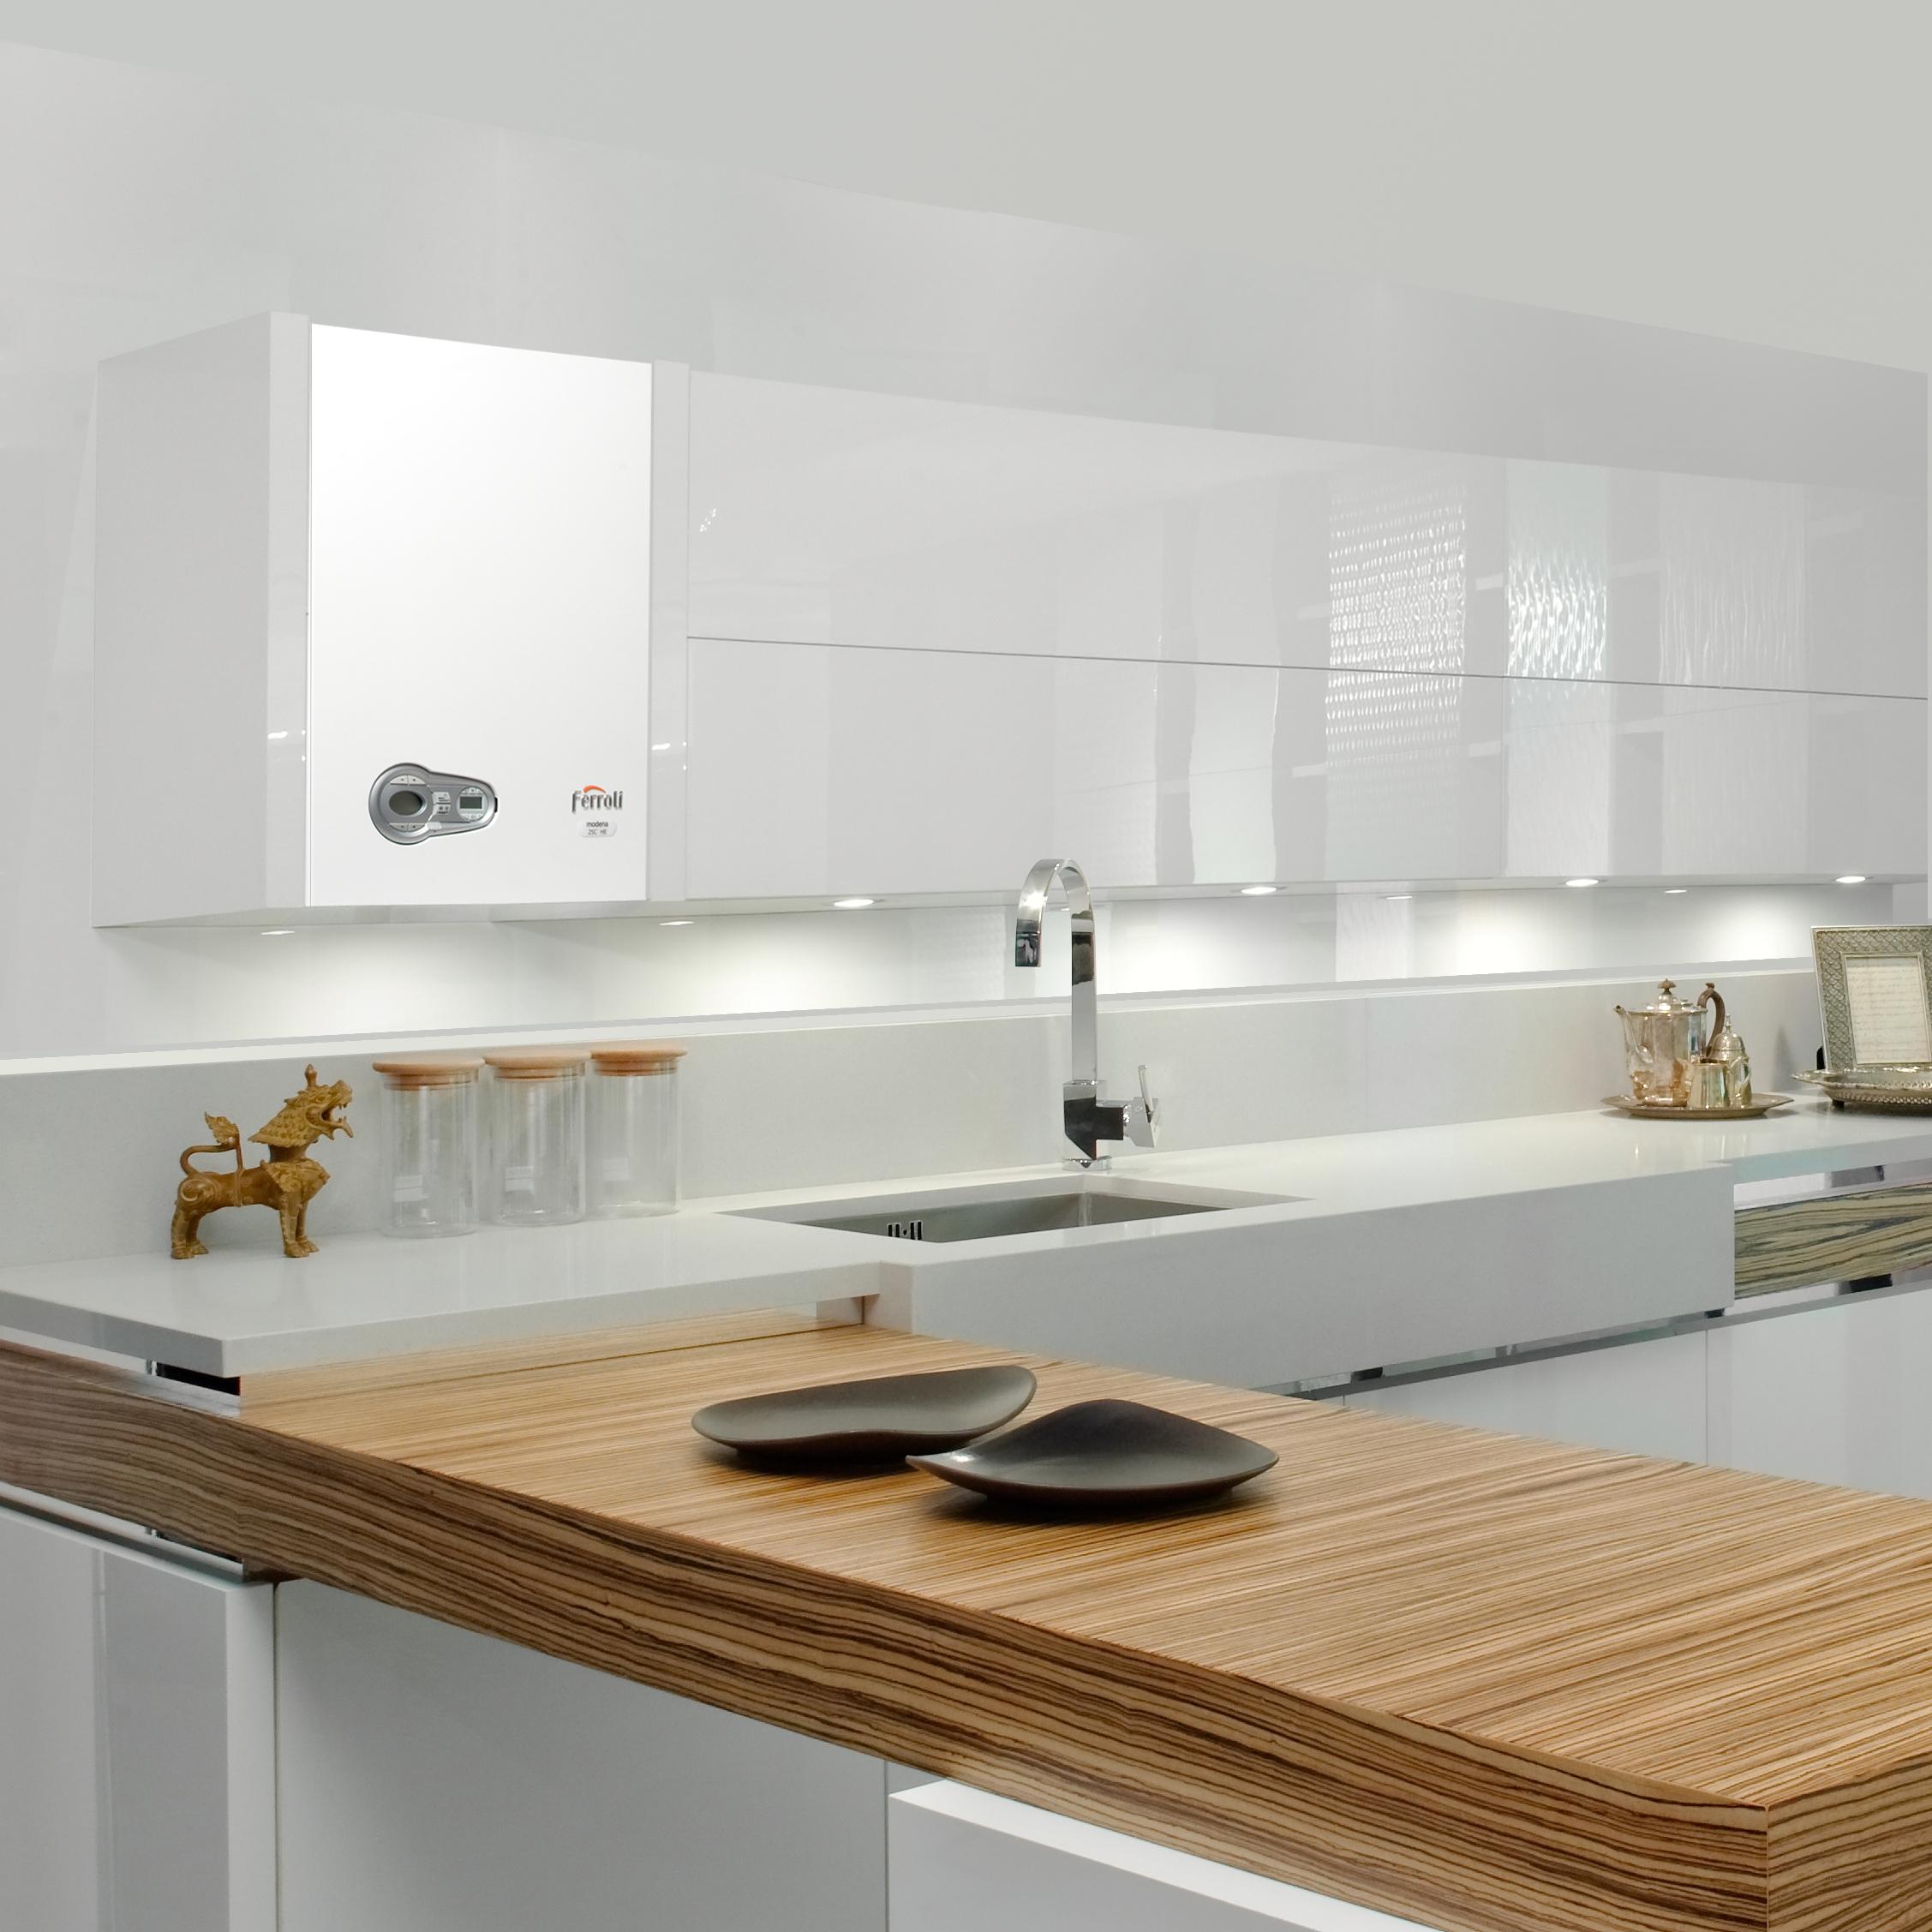 Media ferroli italian boiler manufacturer domestic and for Kitchen set modena